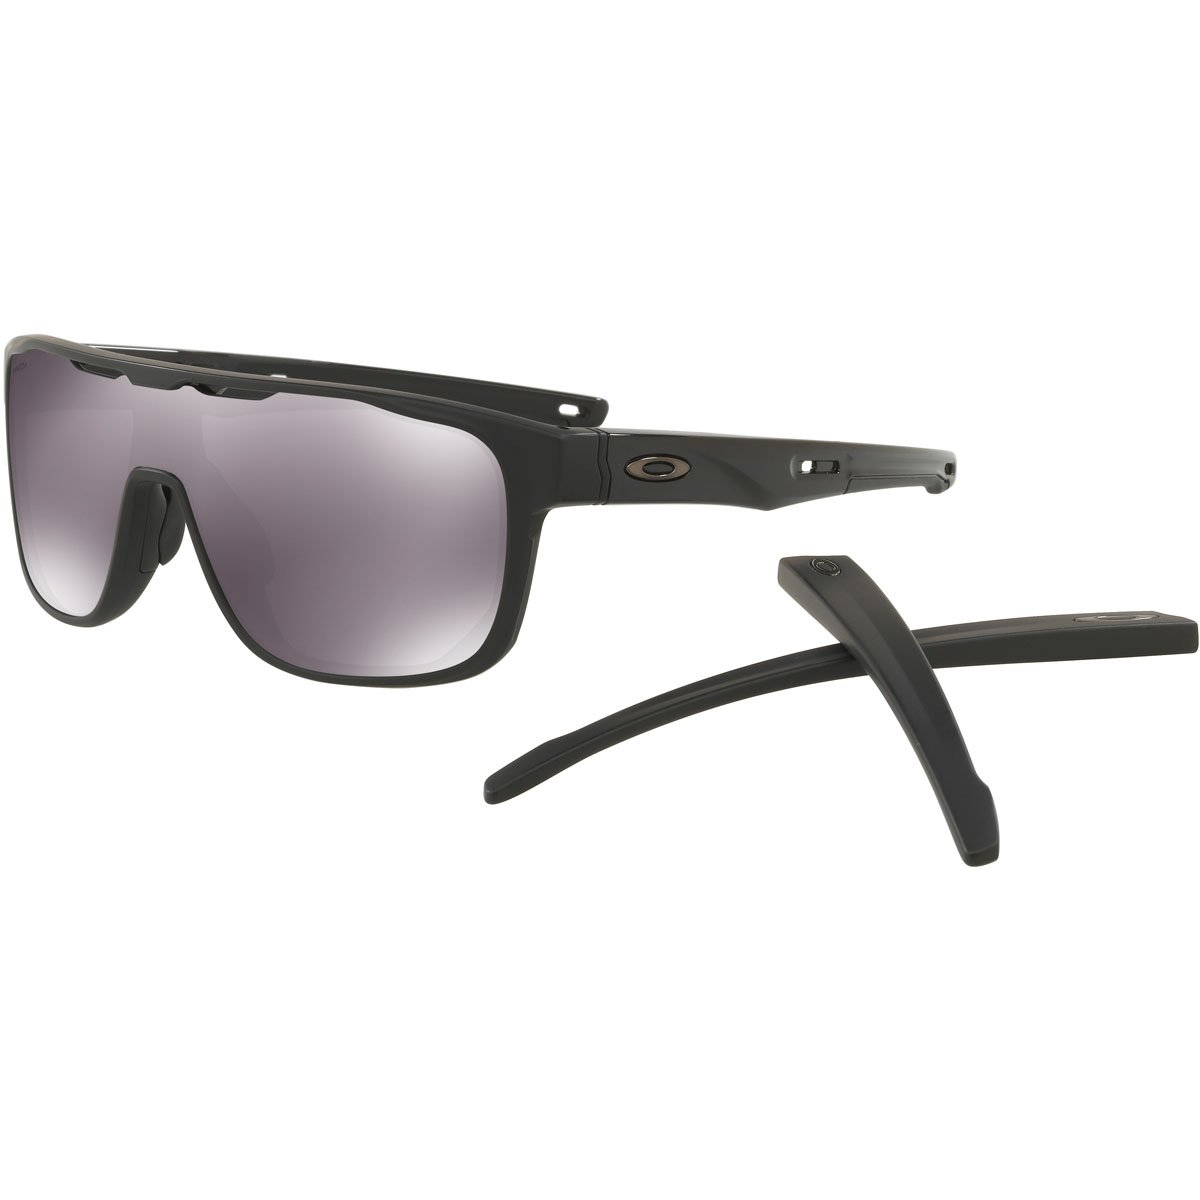 Oakley Crossrange Shield 938702 Gafas, MATTE BLACK/PRIZMBLACK, 31 Hombres